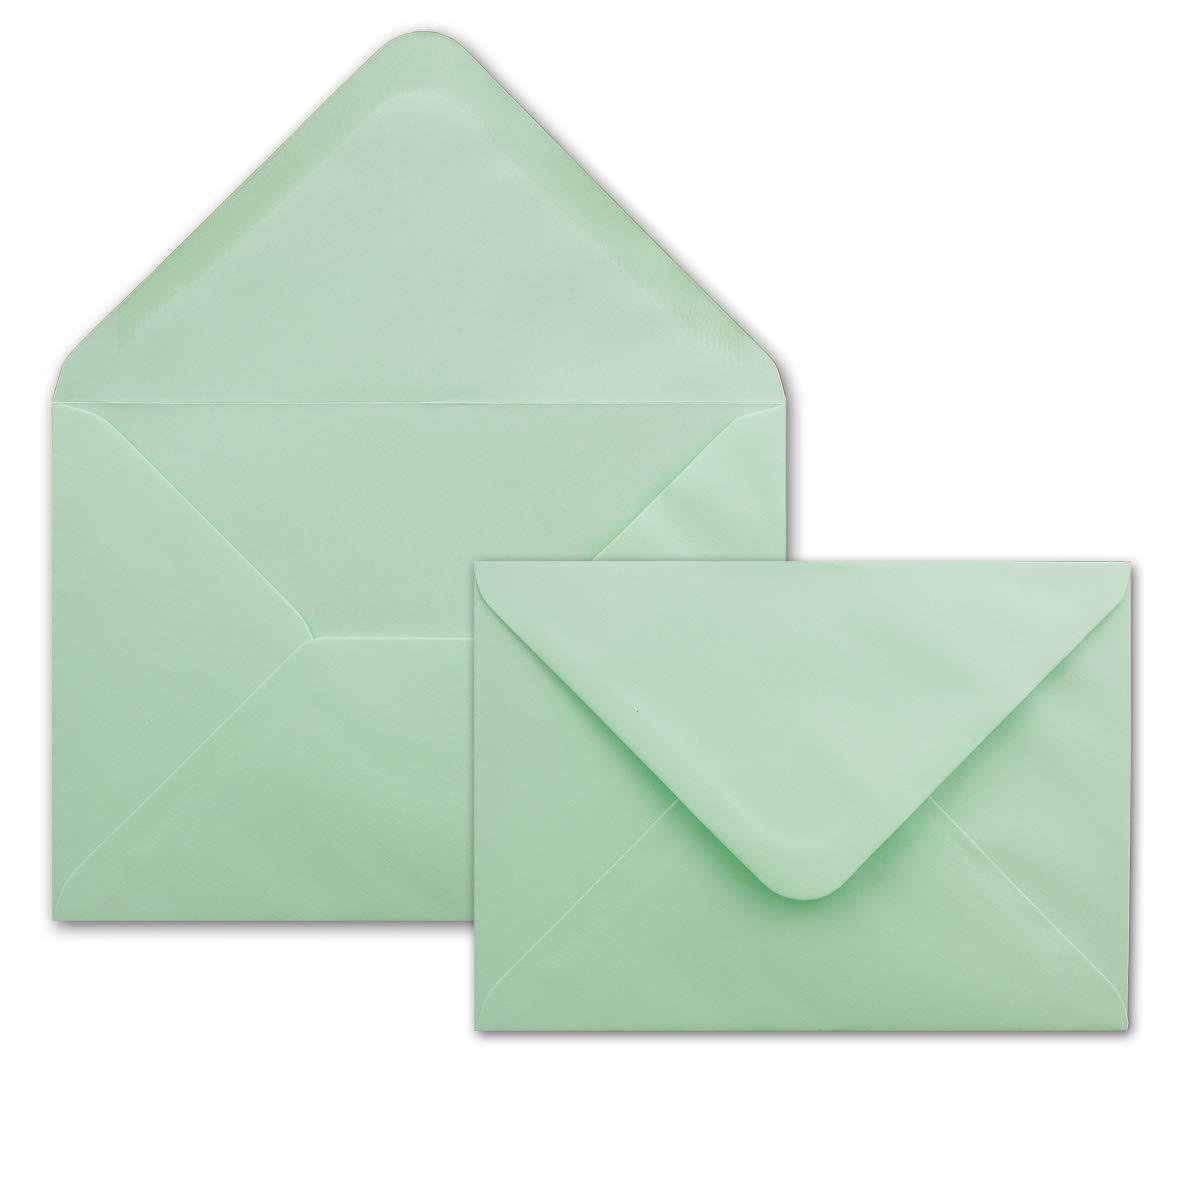 500 DIN DIN DIN C6 Briefumschläge Mintgrün - 11,4 x 16,2 cm - 80 g m² Nassklebung spitze Klappe - aus der Serie Colours-4-you - Glüxx-Agent B07PHYRZVP | Großer Verkauf  4a6b72